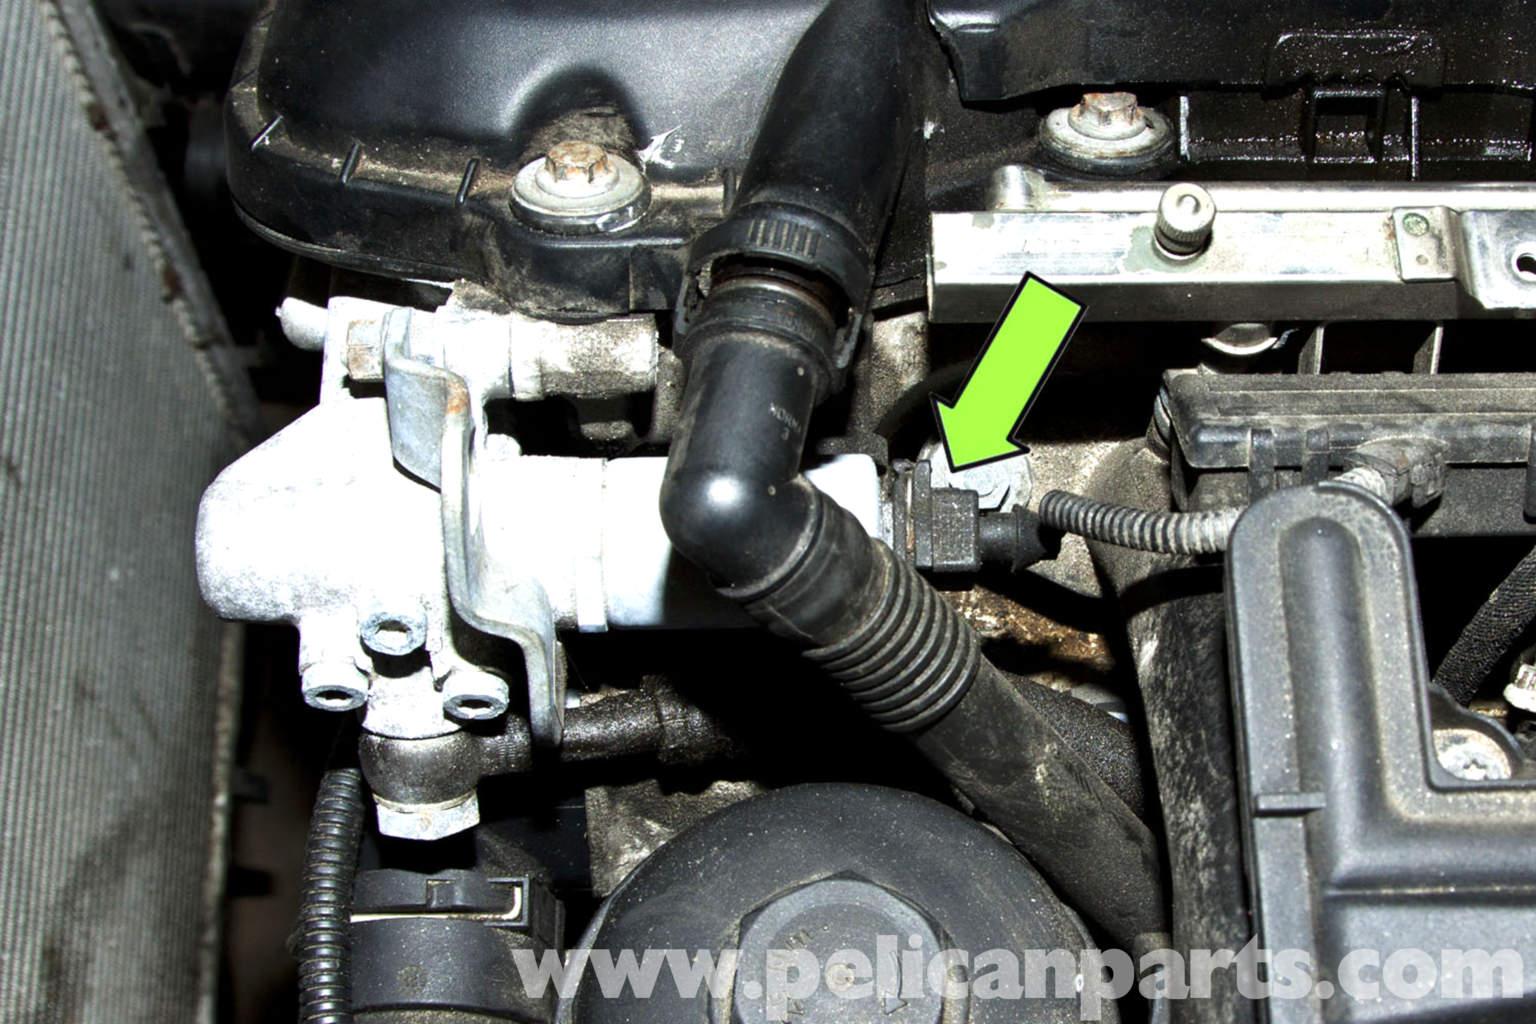 Bmw e46 camshaft sensor replacement